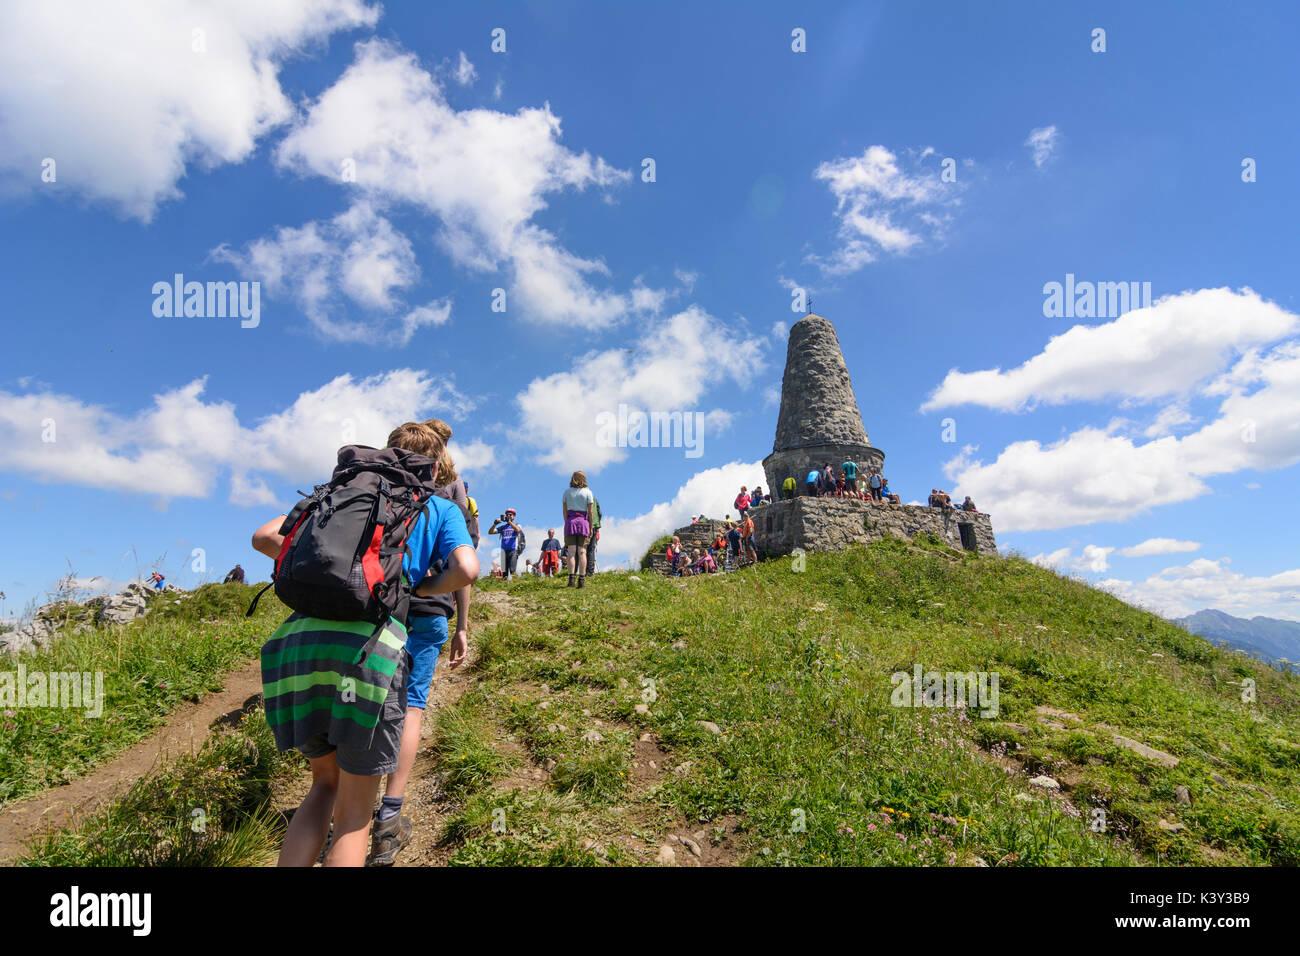 mountain summit Grünten,  Gebirgsjäger monument, hiker, Burgberg im Allgäu, Schwaben, Allgäu, Swabia, Bayern, Bavaria, Stock Photo